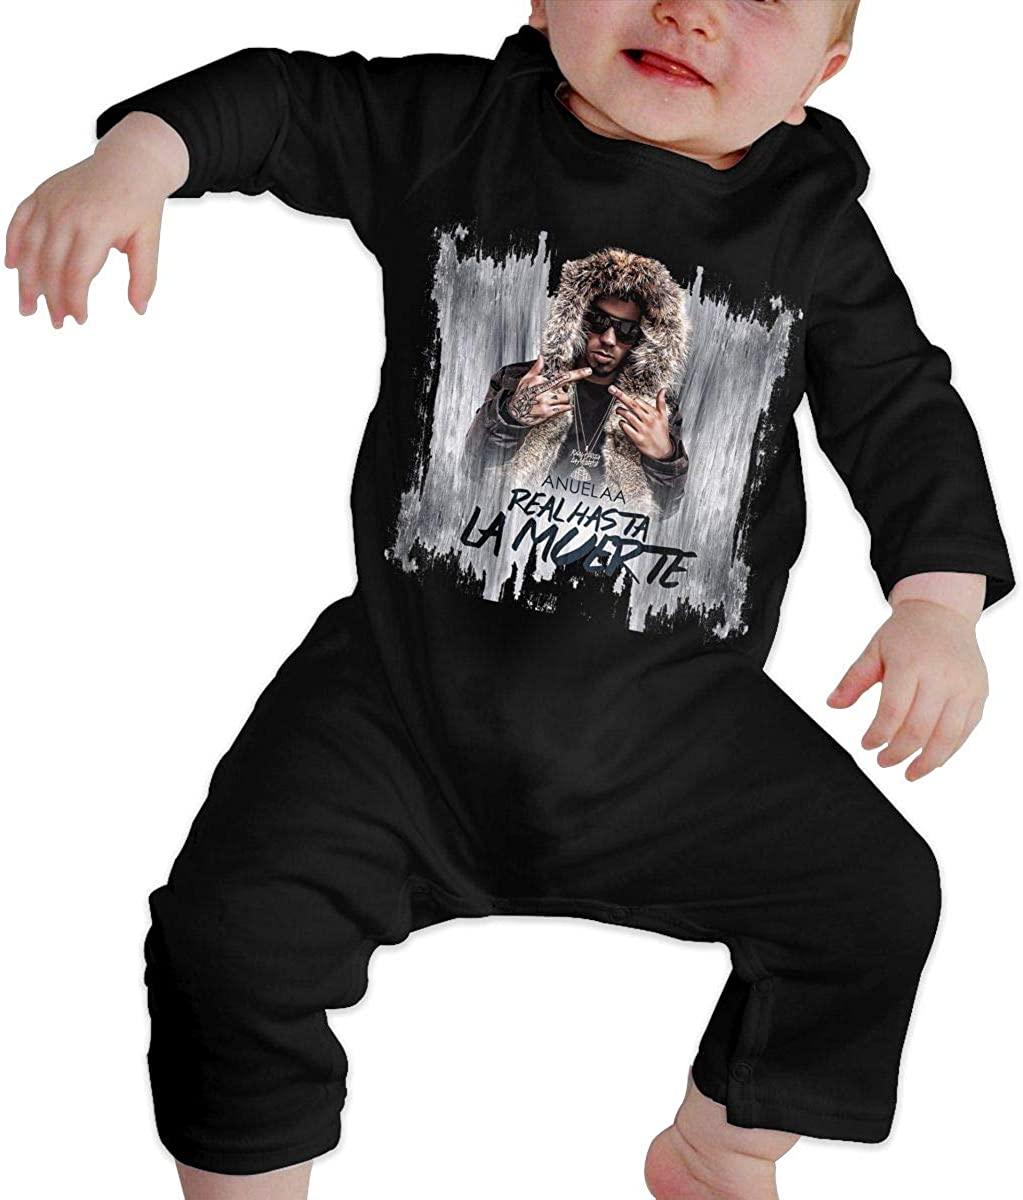 Watkinsmarket Anuel-AA Baby Boy Girl Jumpsuit Jumpsuit Baby Newborn Cotton Long Sleeve Jumpsuit Black